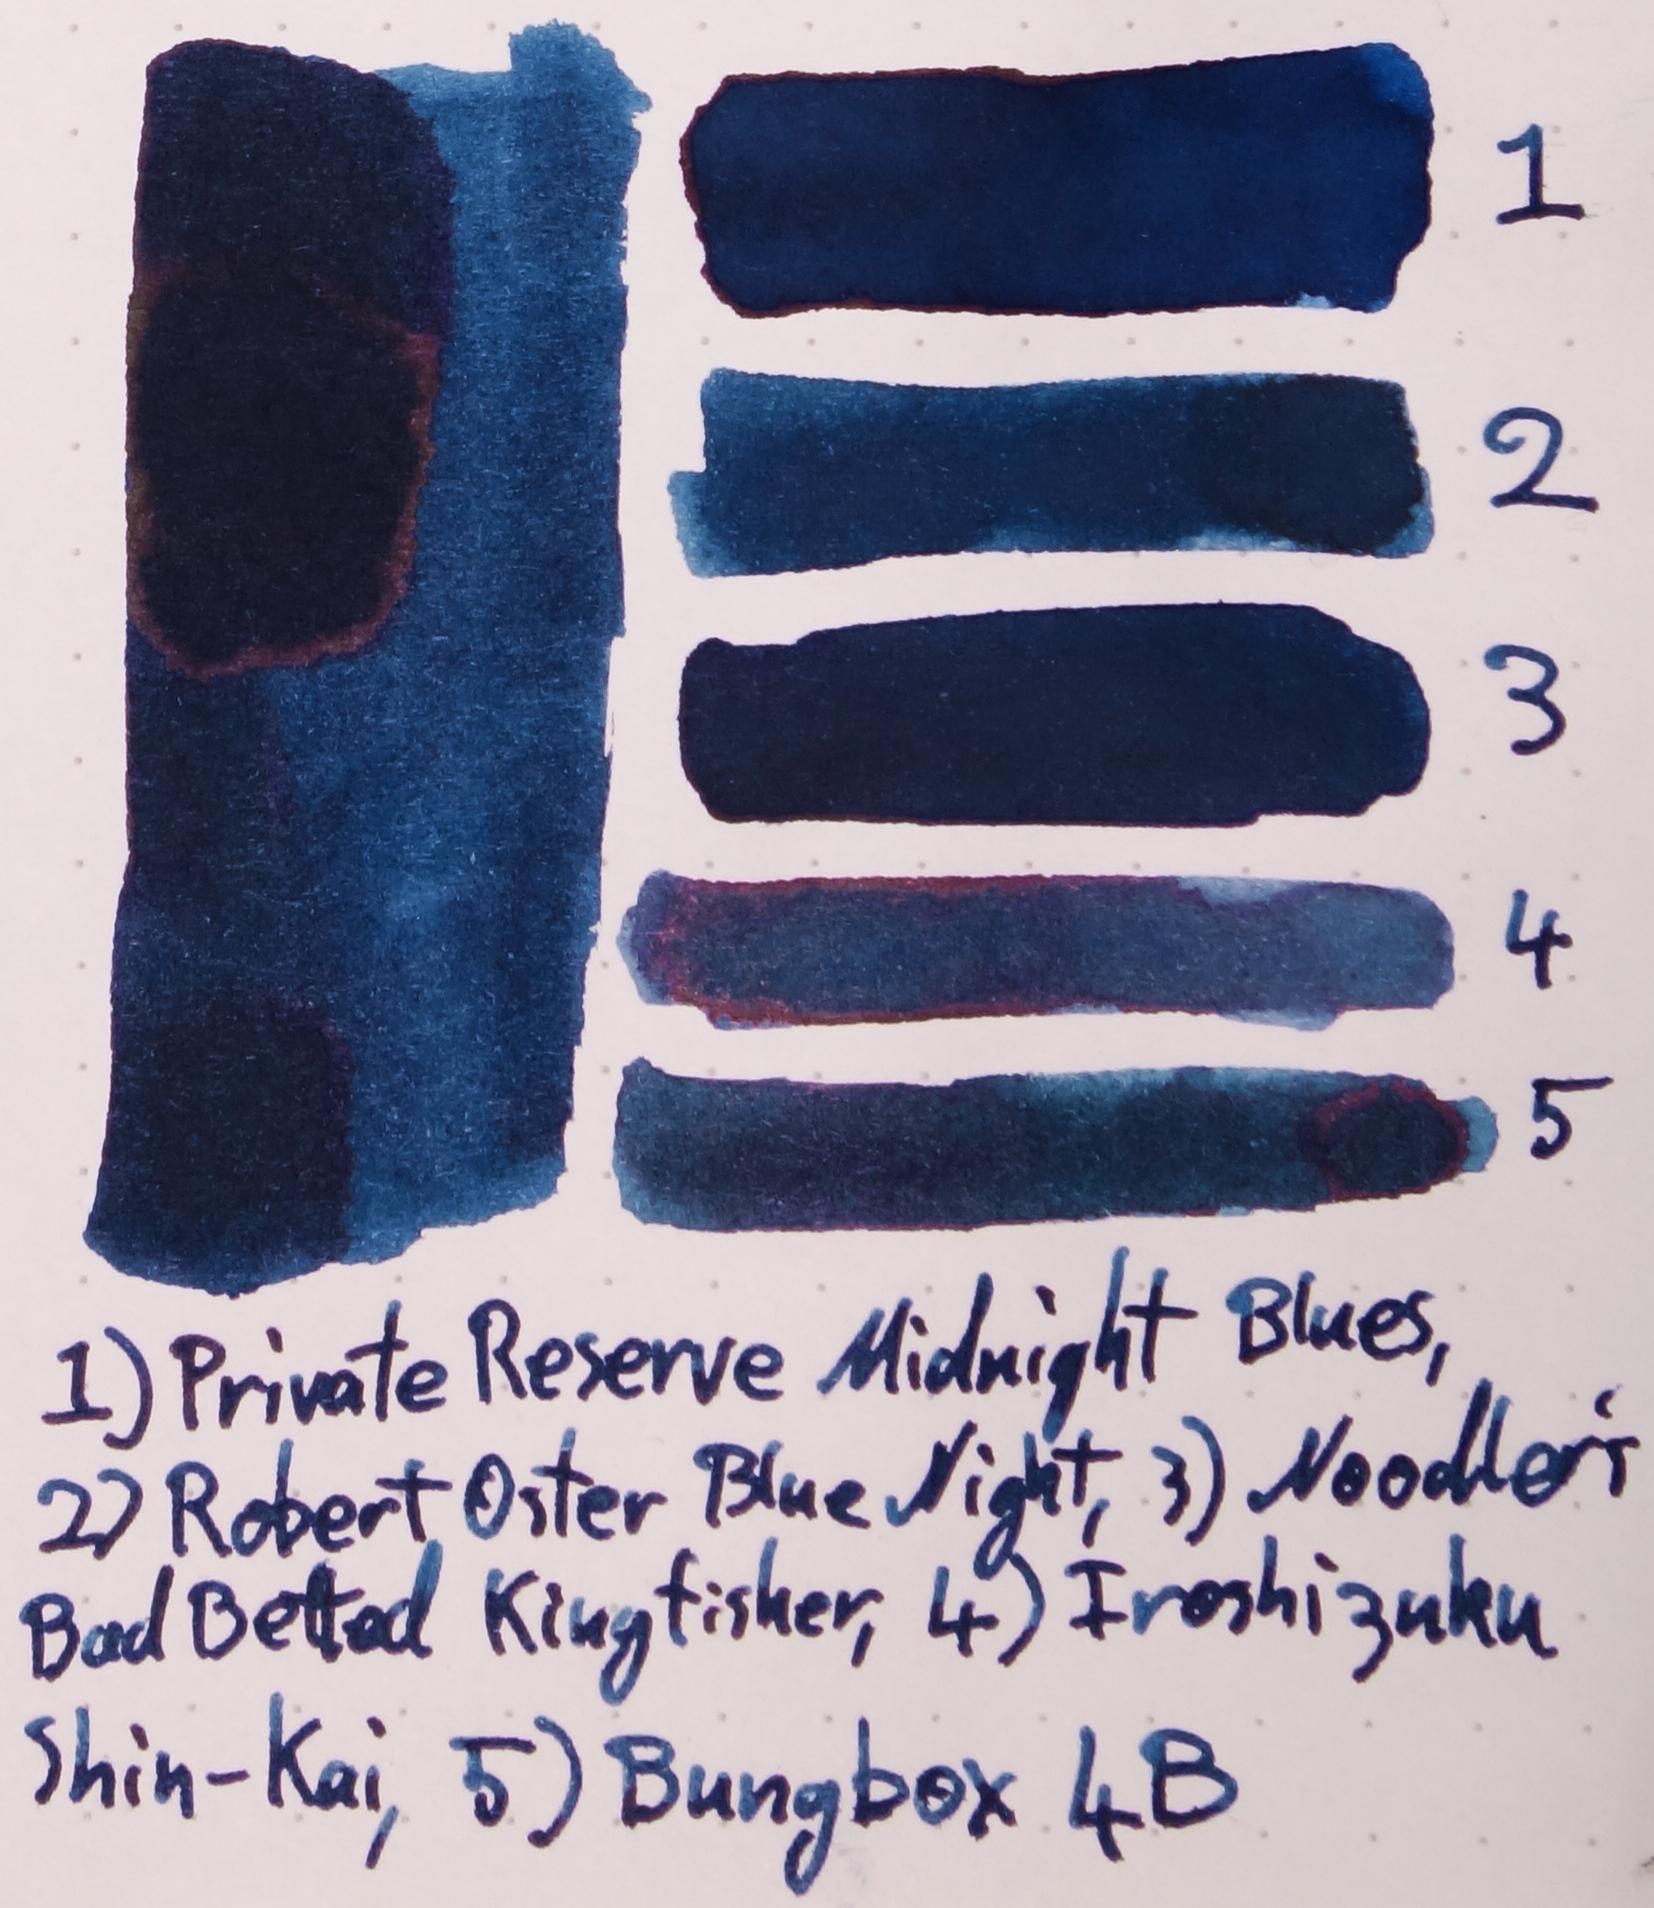 1) Private Reserve Midnight Blues, 2) Robert Oster Blue Night, 3) Noodler's Bad Belted Kingfisher, 4) Iroshizuku Shin-Kai, 5) Bungubox 4B.